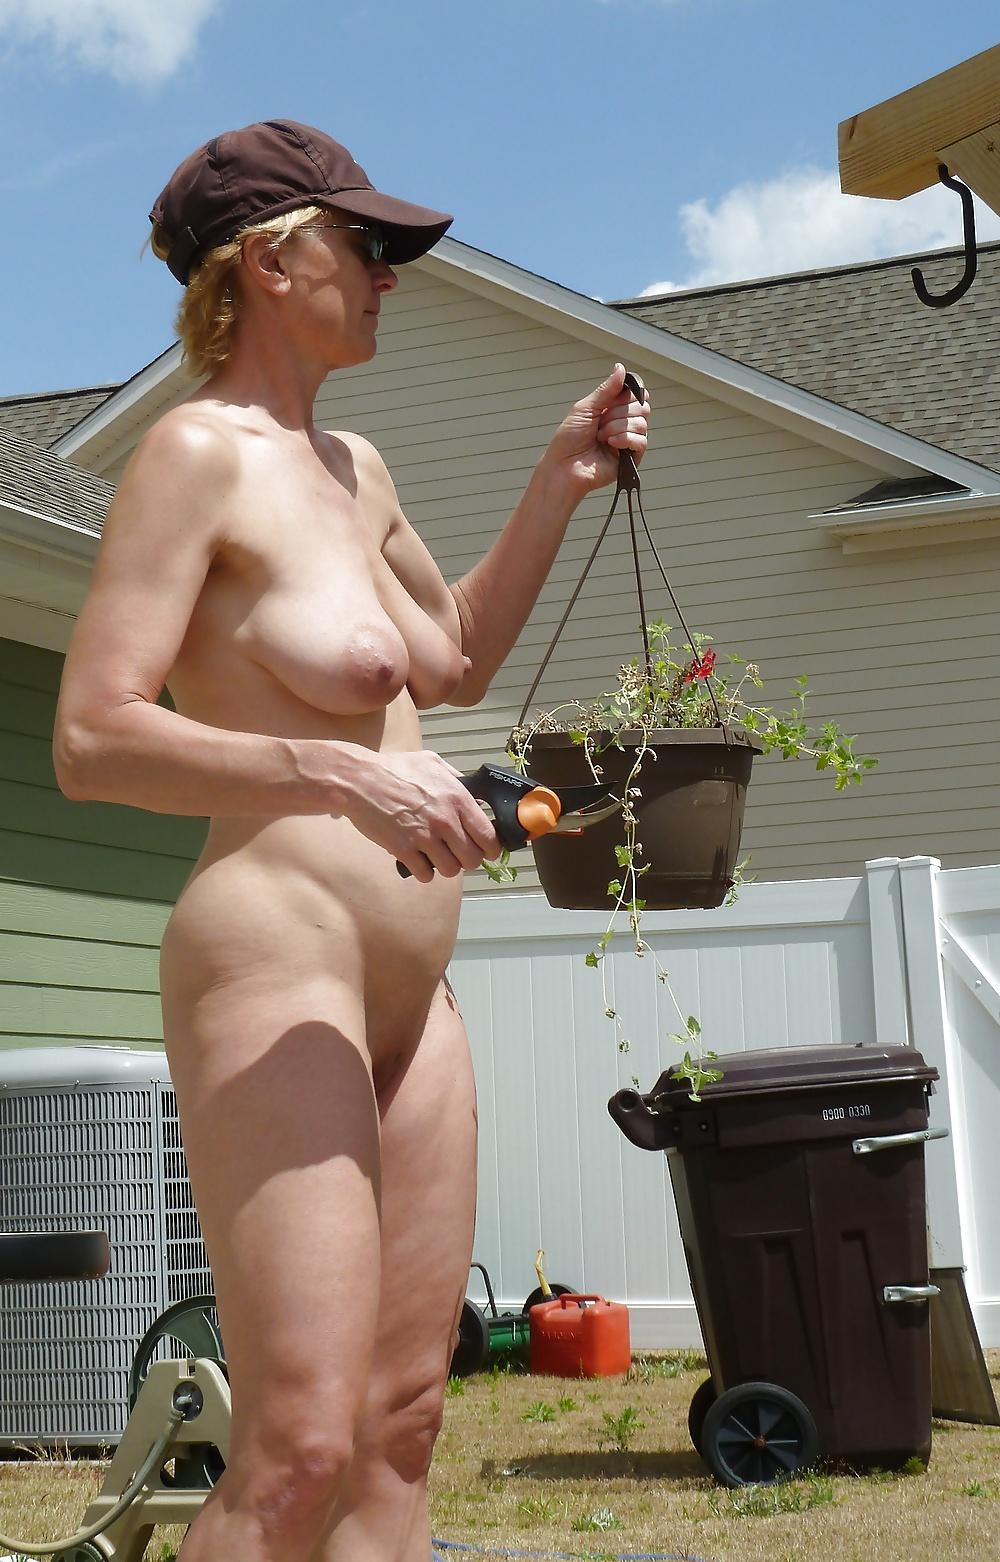 ass-garden-nude-wife-amateur-couple-xxx-gif